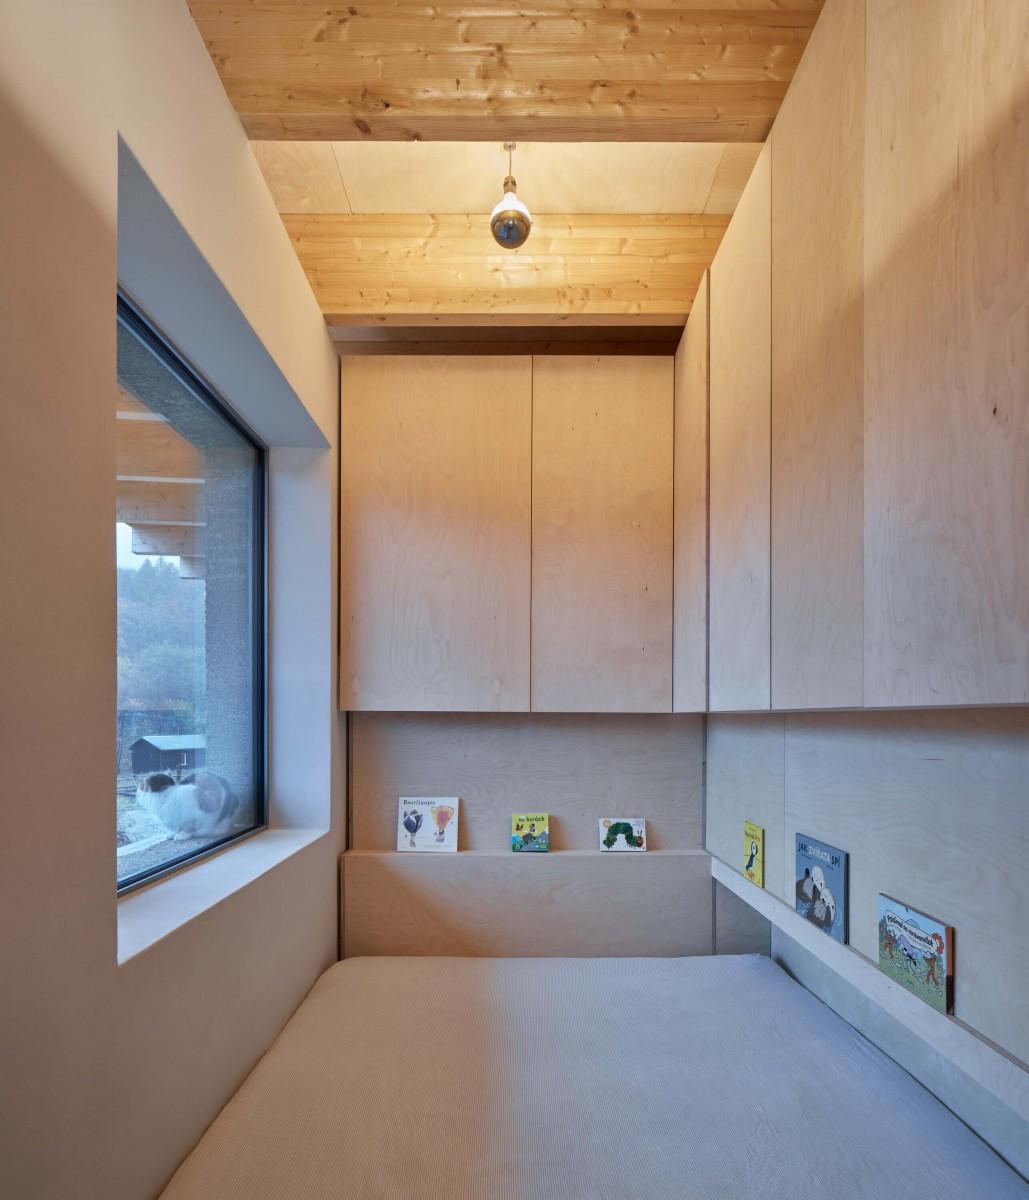 lina bellovic house lo boysplaynice 22